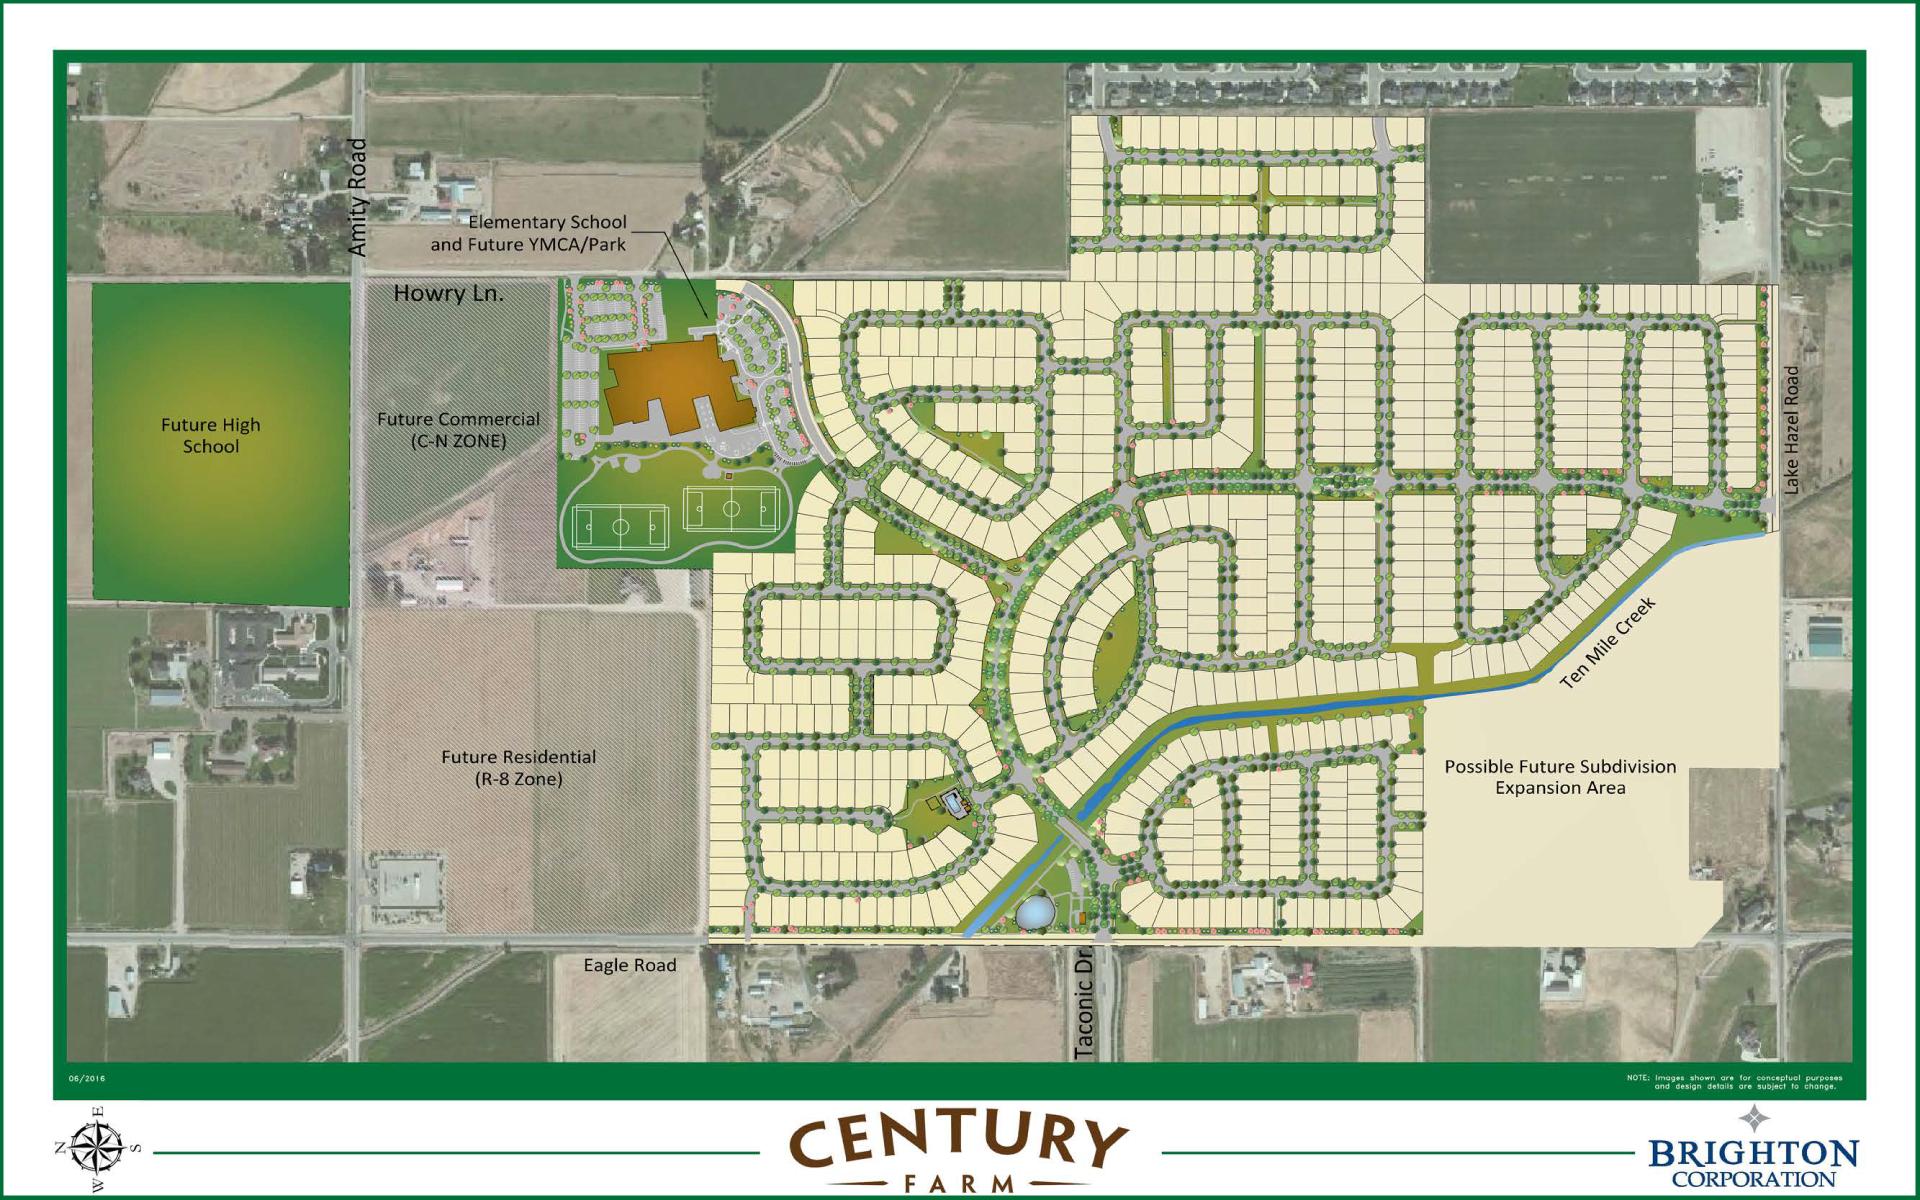 Century Farm Master Plan Brighton Corporation